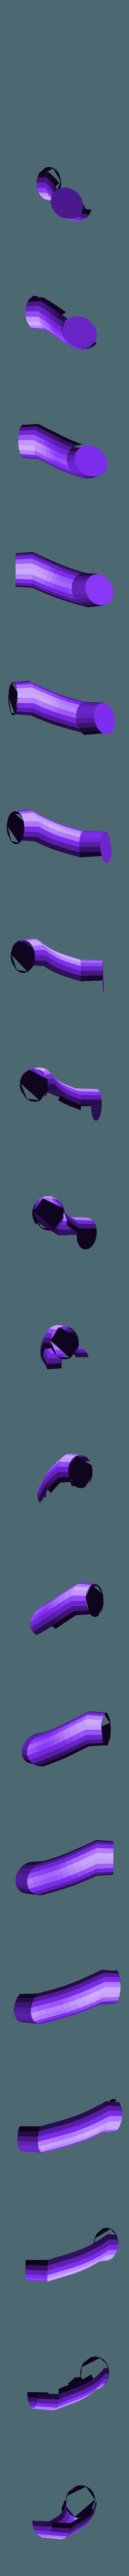 orange_leg_3_left.stl Download free STL file Wiggler from Mario games - multi-color • Template to 3D print, bpitanga